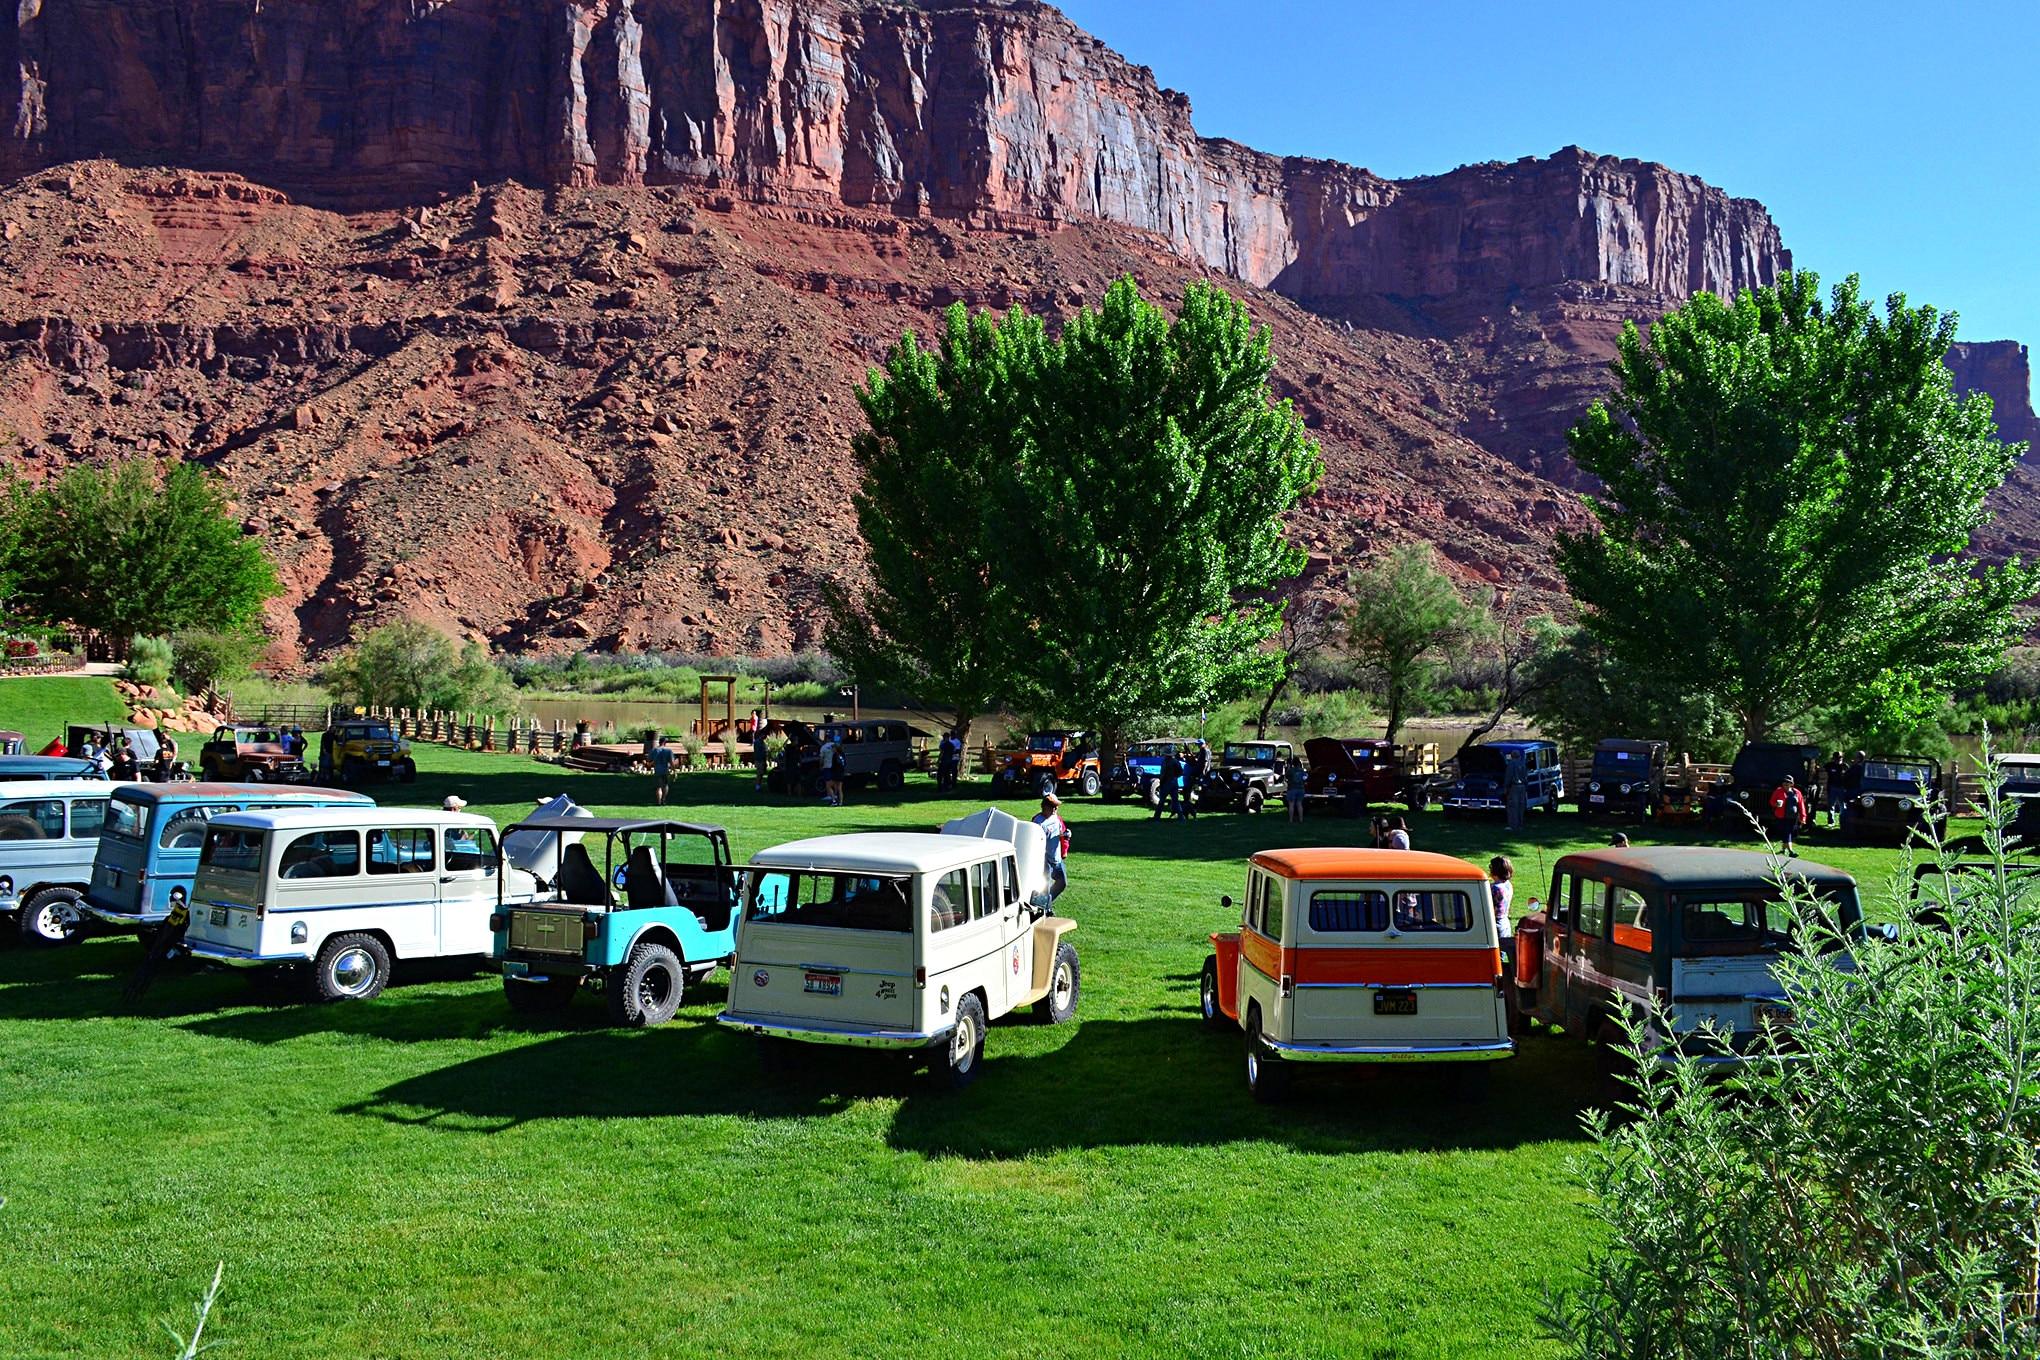 051 willys rally moab 2018 gallery.JPG